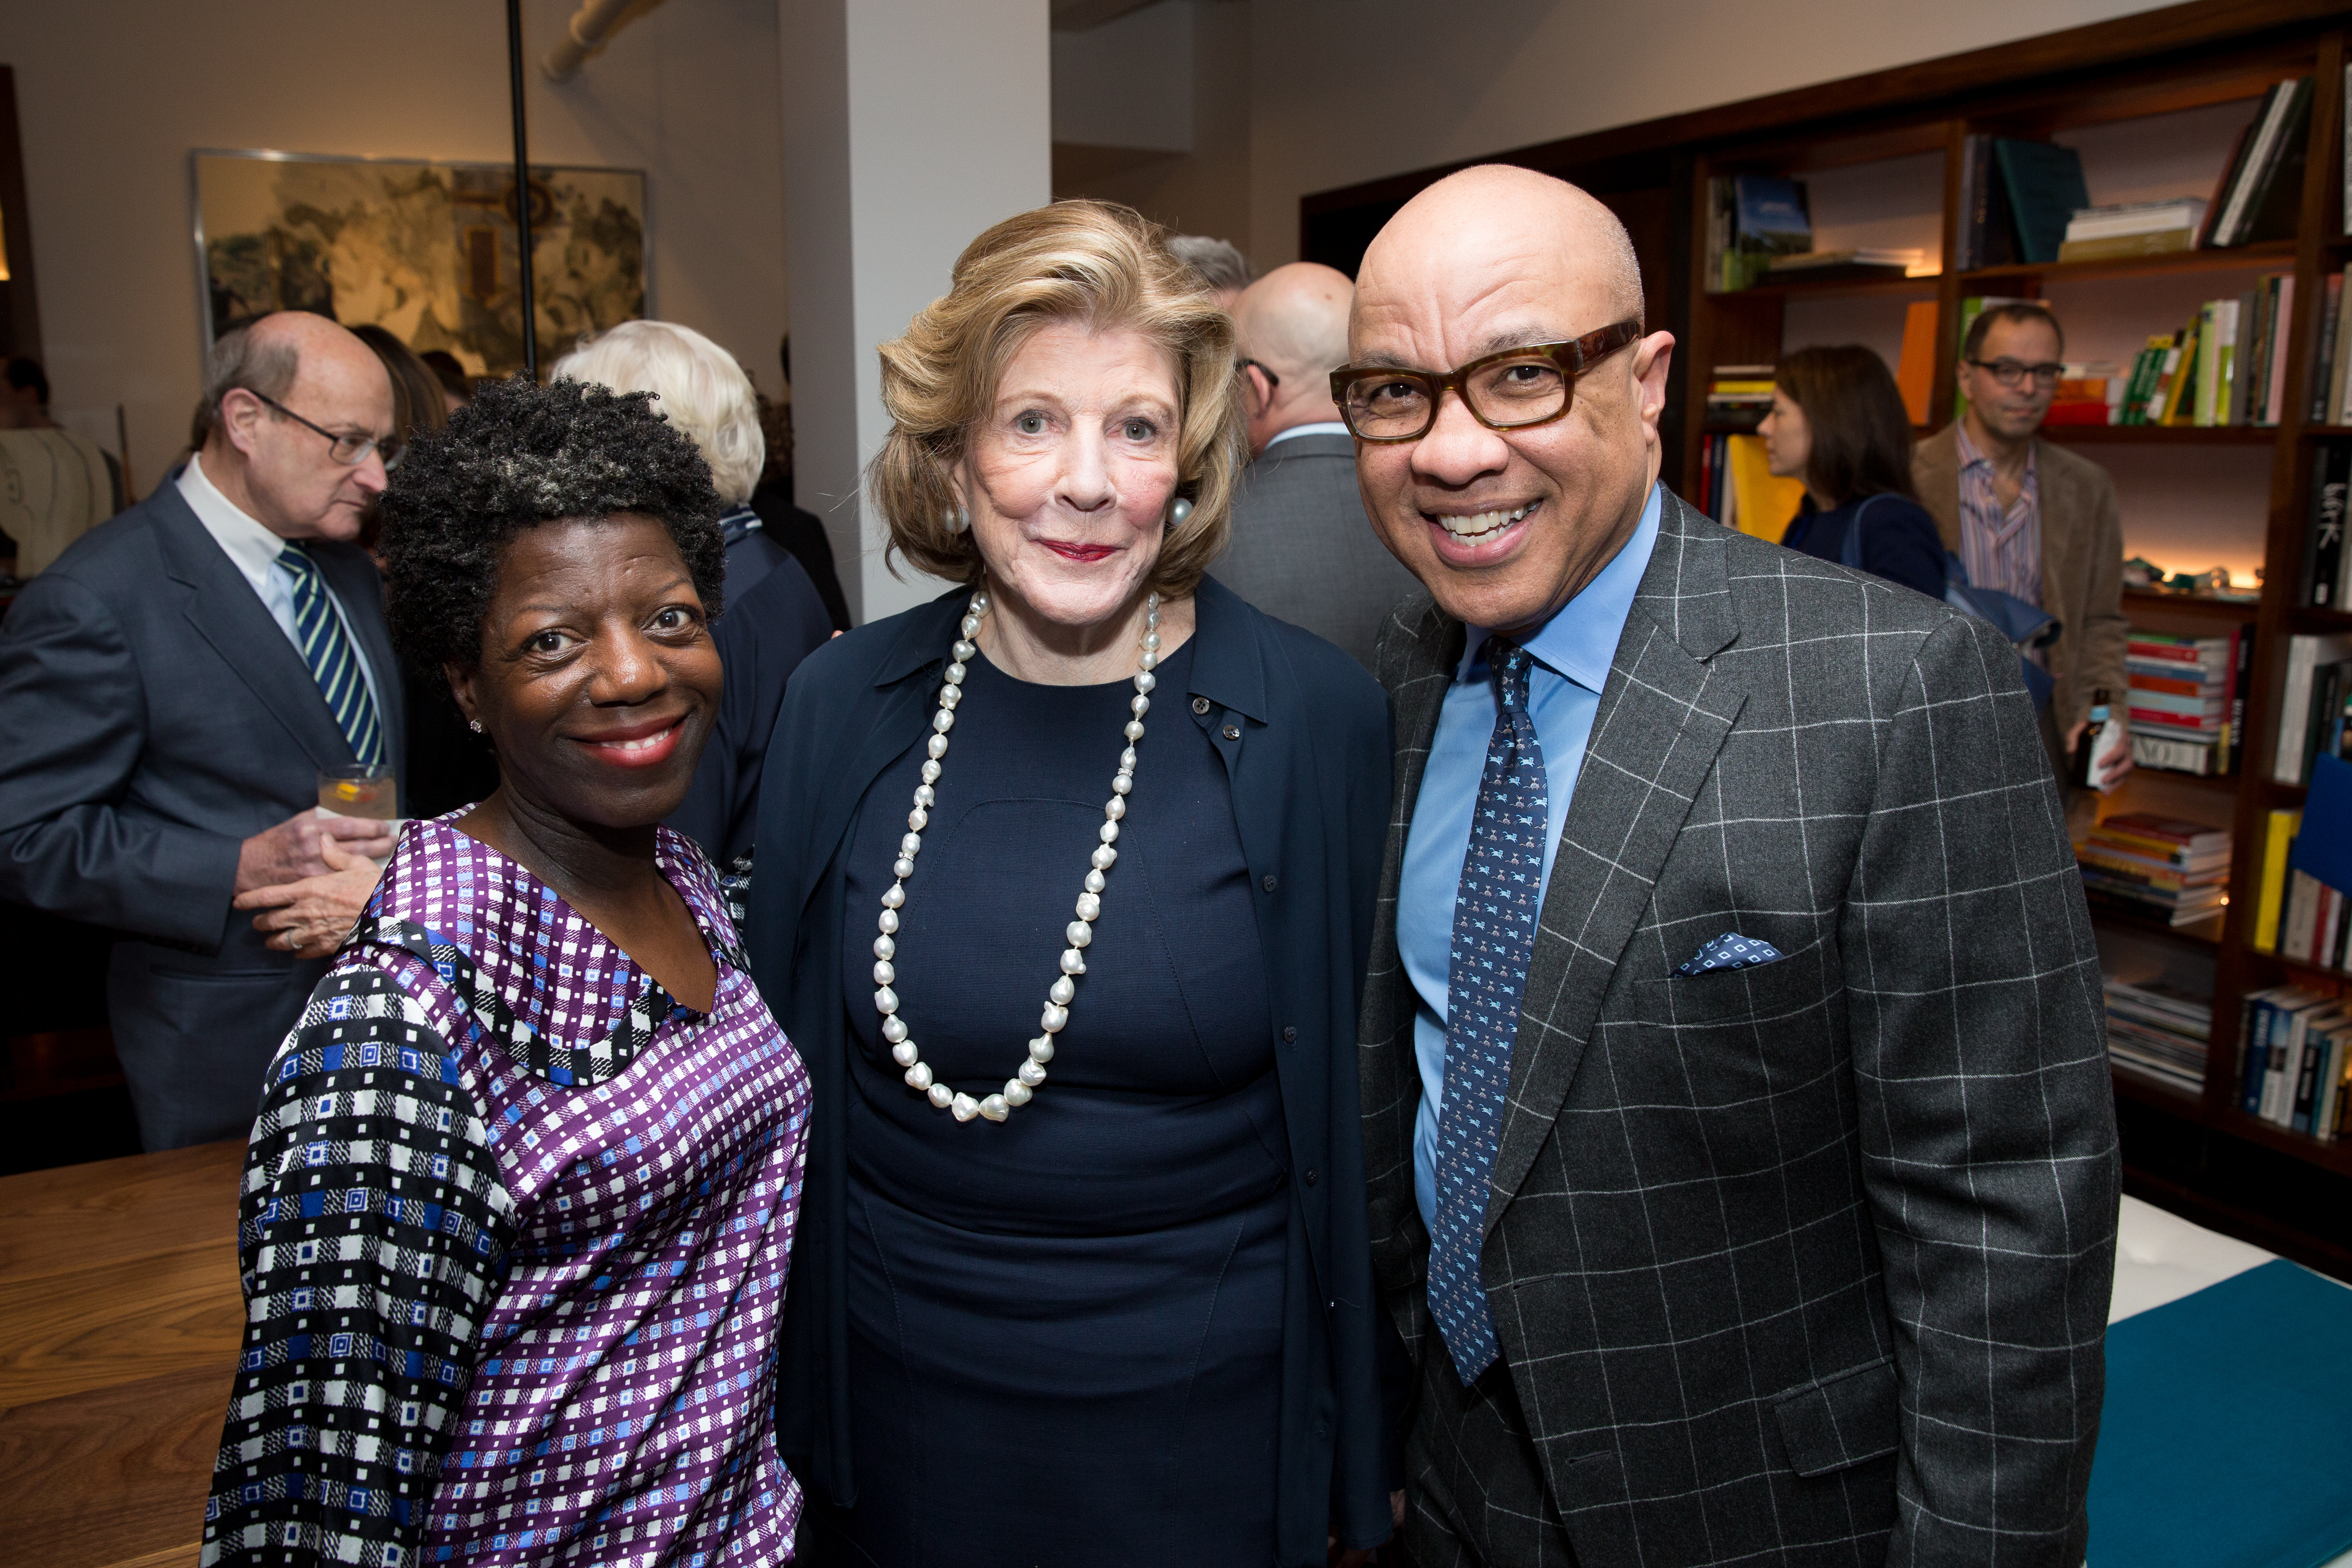 (L to R) Thelma Golden, Agnes Gund, and Darren Walker.